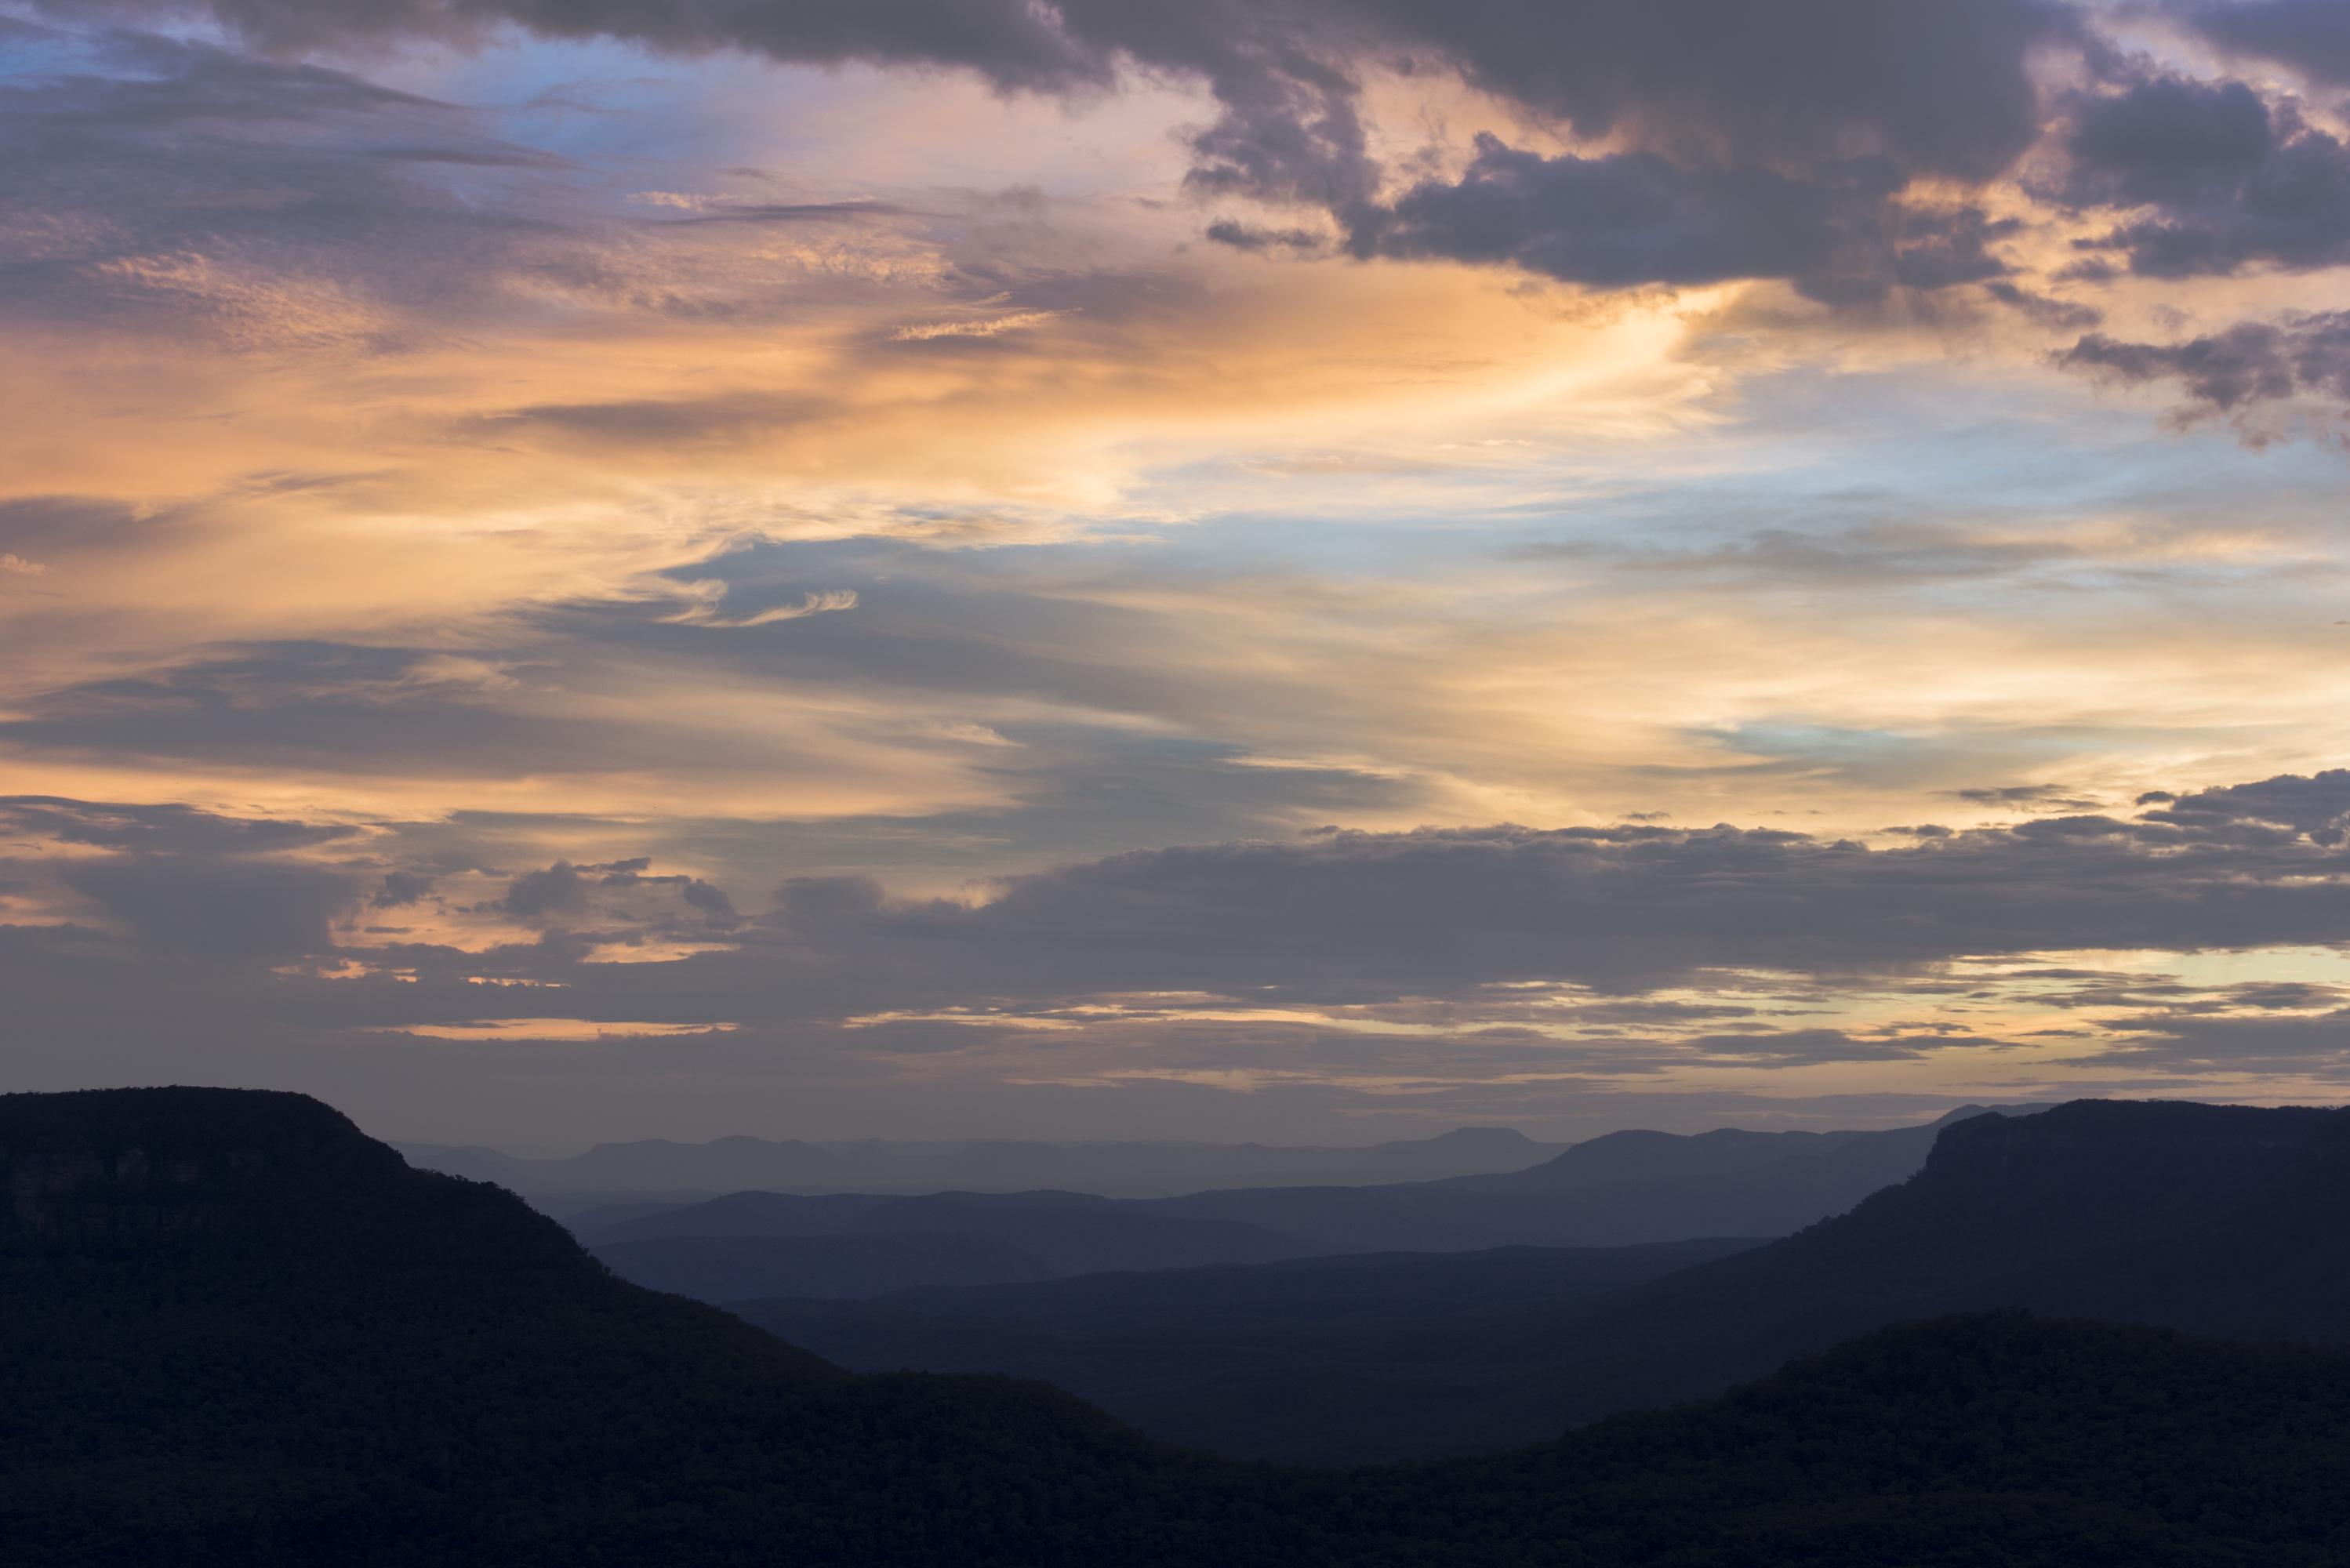 Denesa Chan Photographer Australia Thre Sisters Sunset Amazing-4637 72 dpi